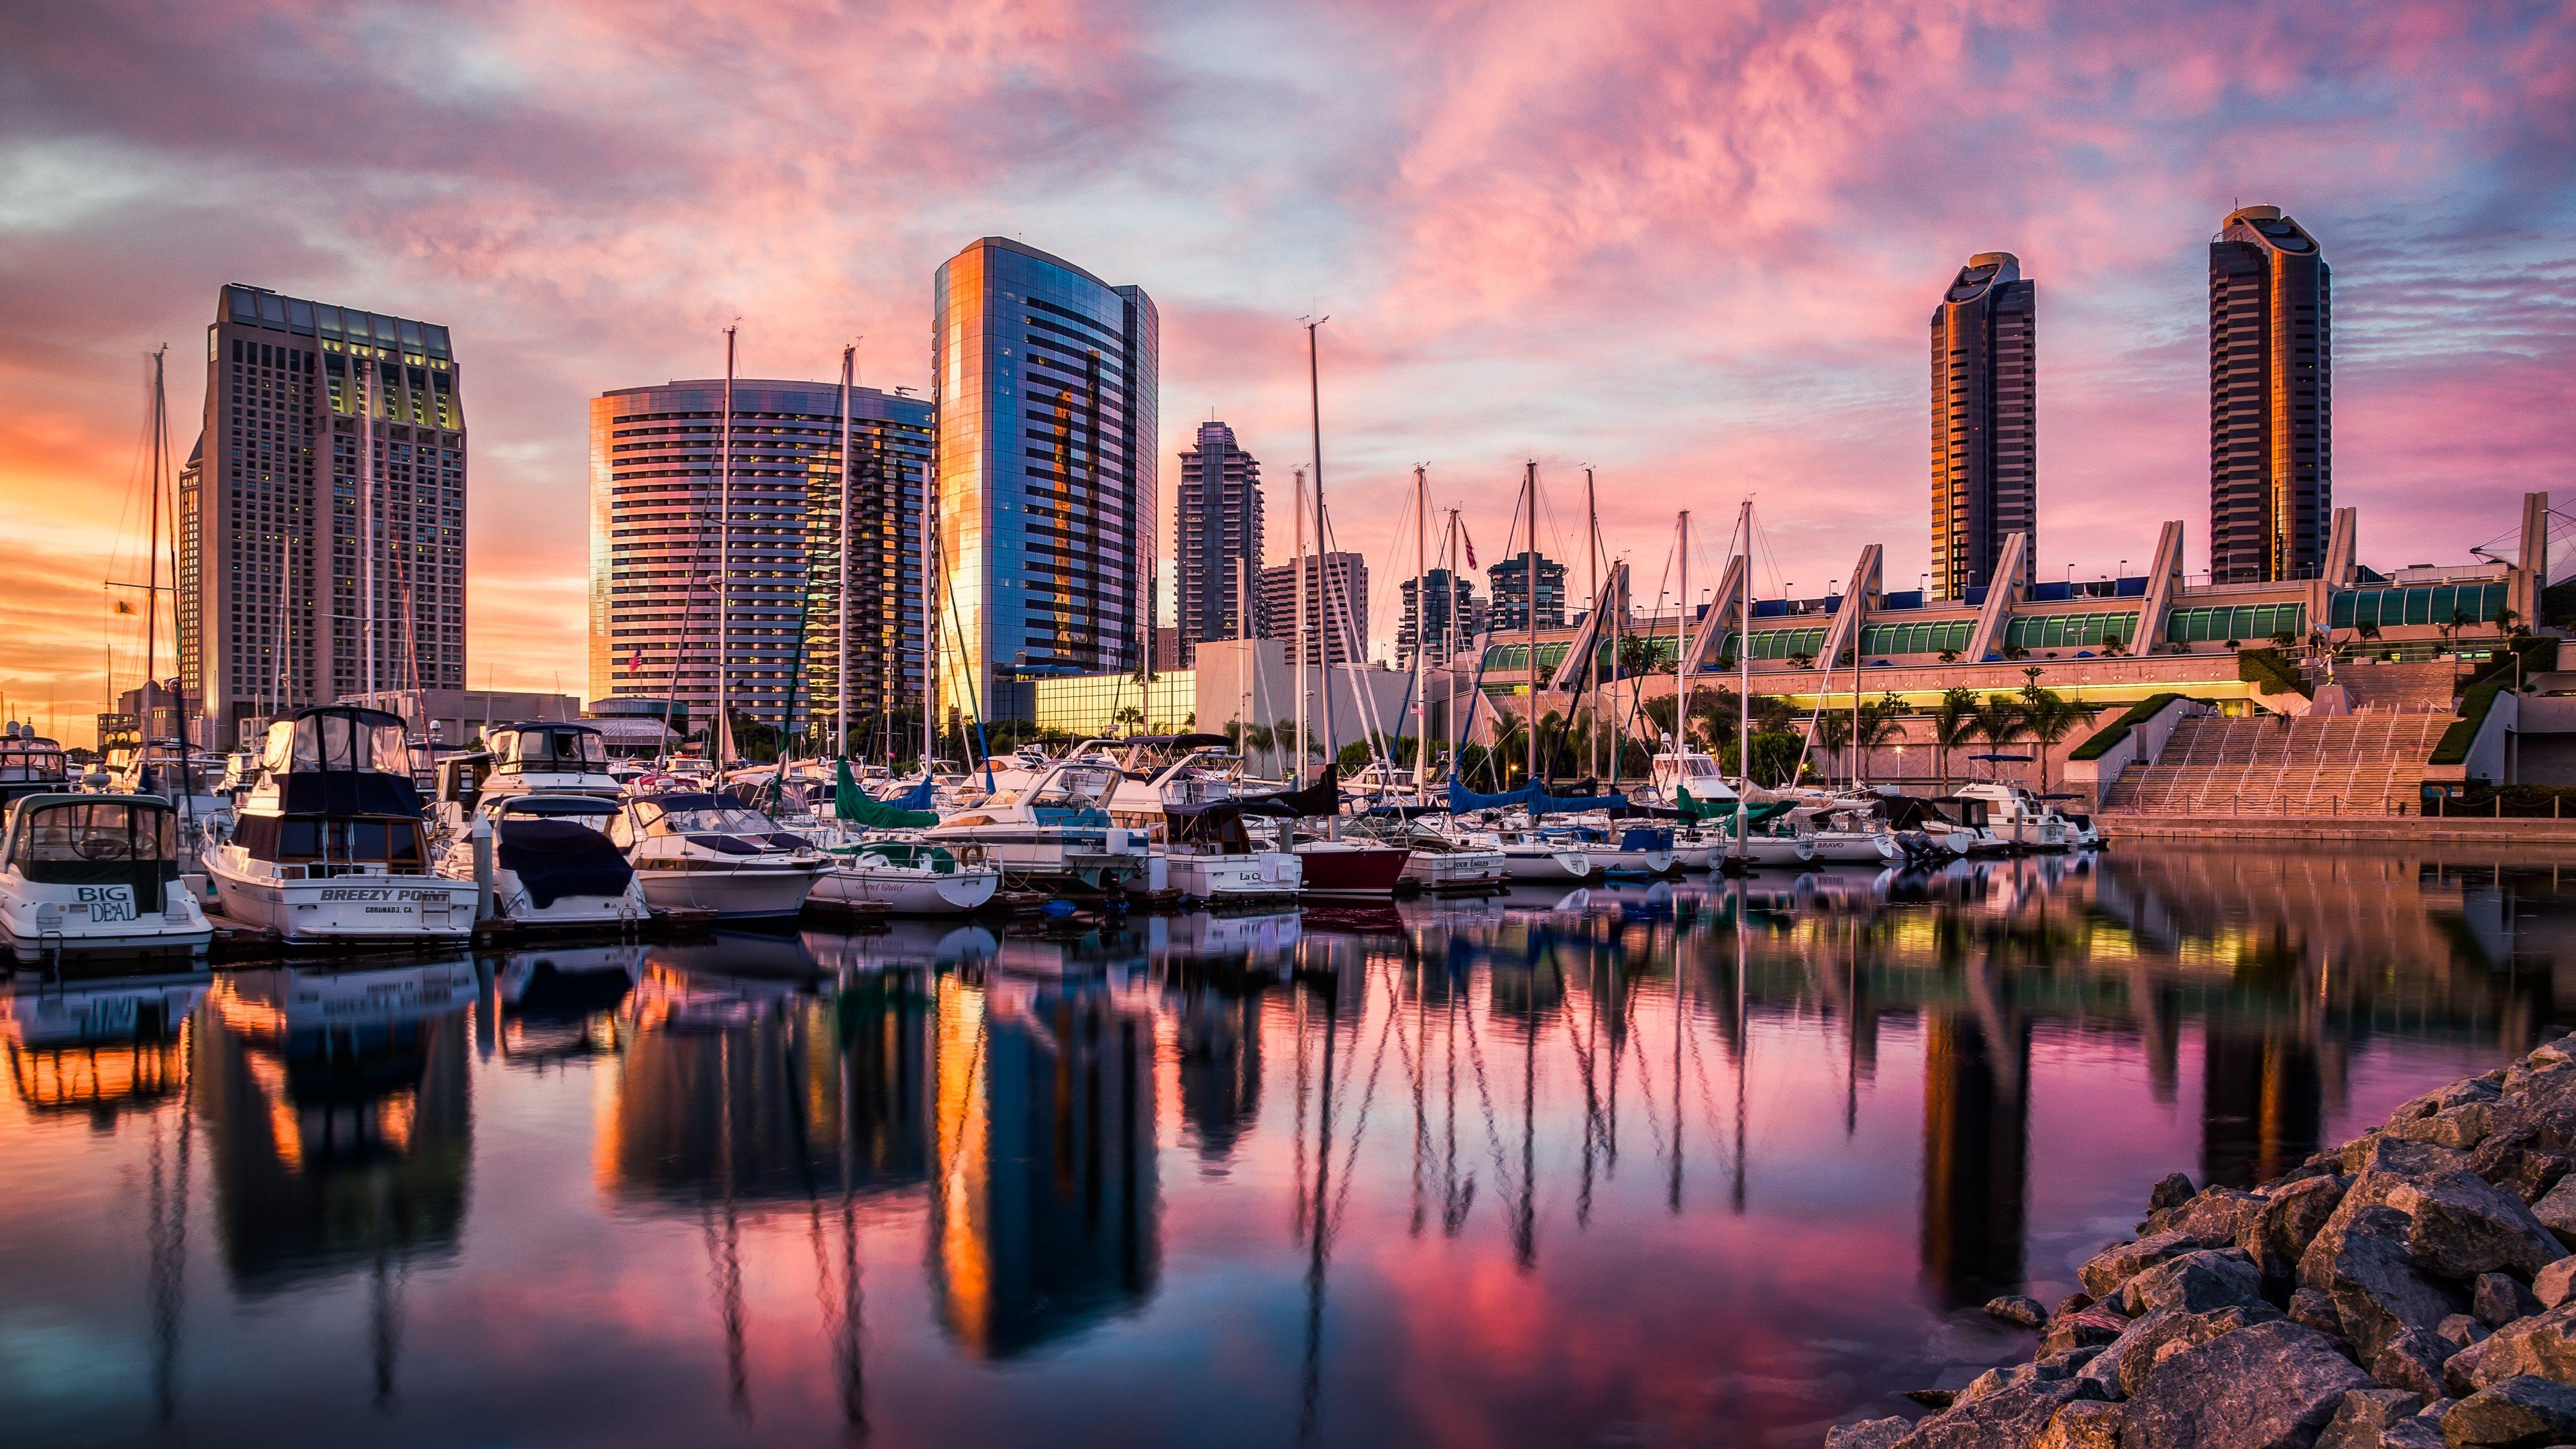 San Diego Sunset 3840x2160